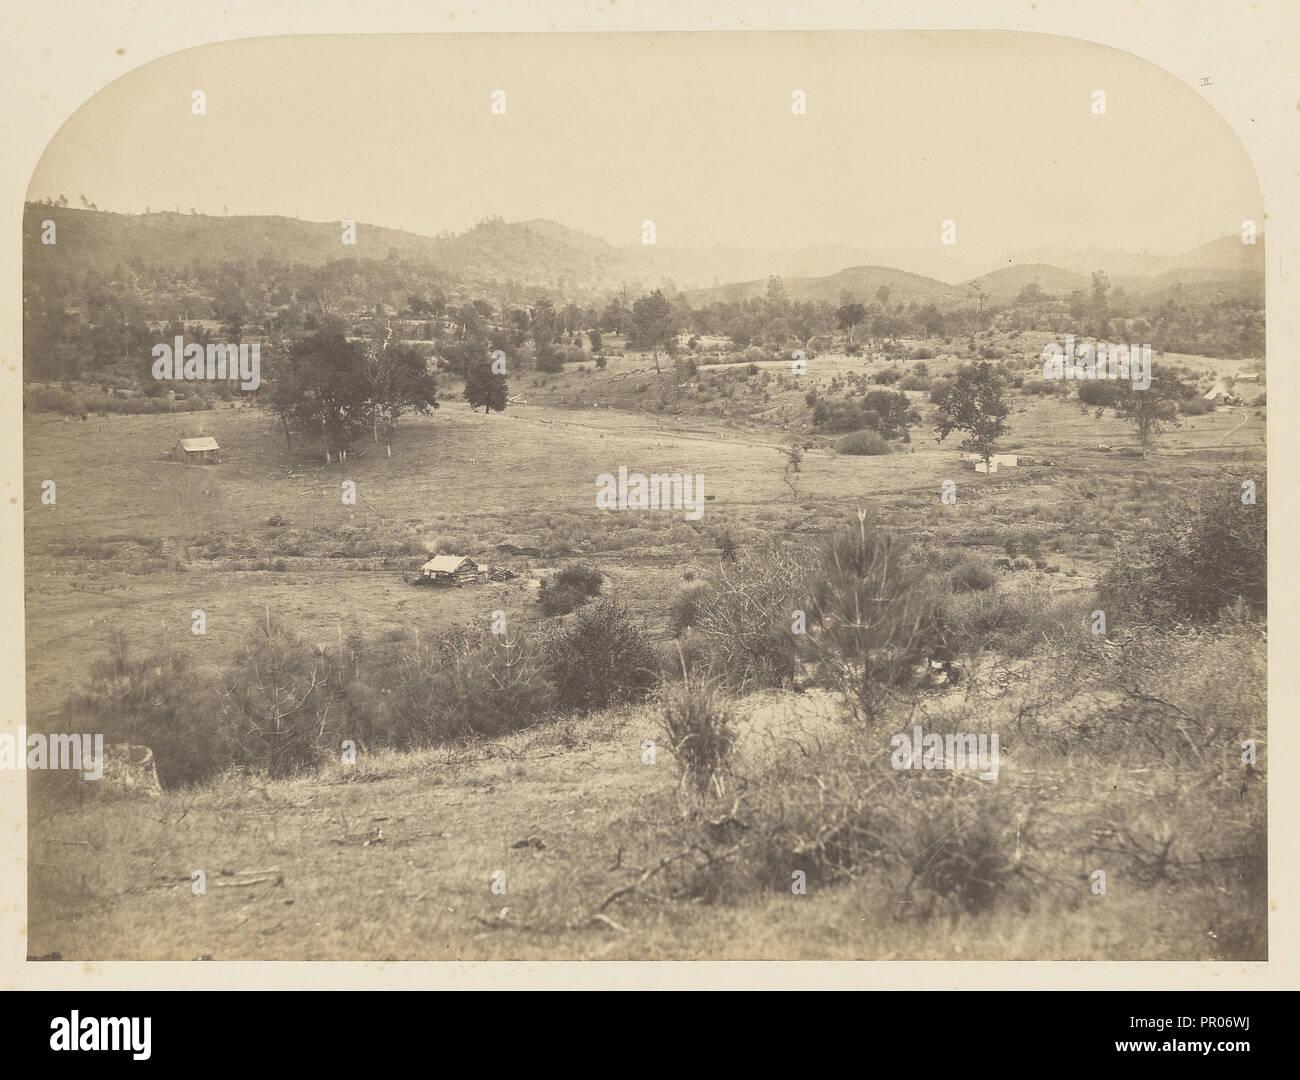 Site of Camp of J.C. Fremont, Agua Fria, 1847; Carleton Watkins, American, 1829 - 1916, 1860; Salted paper print - Stock Image